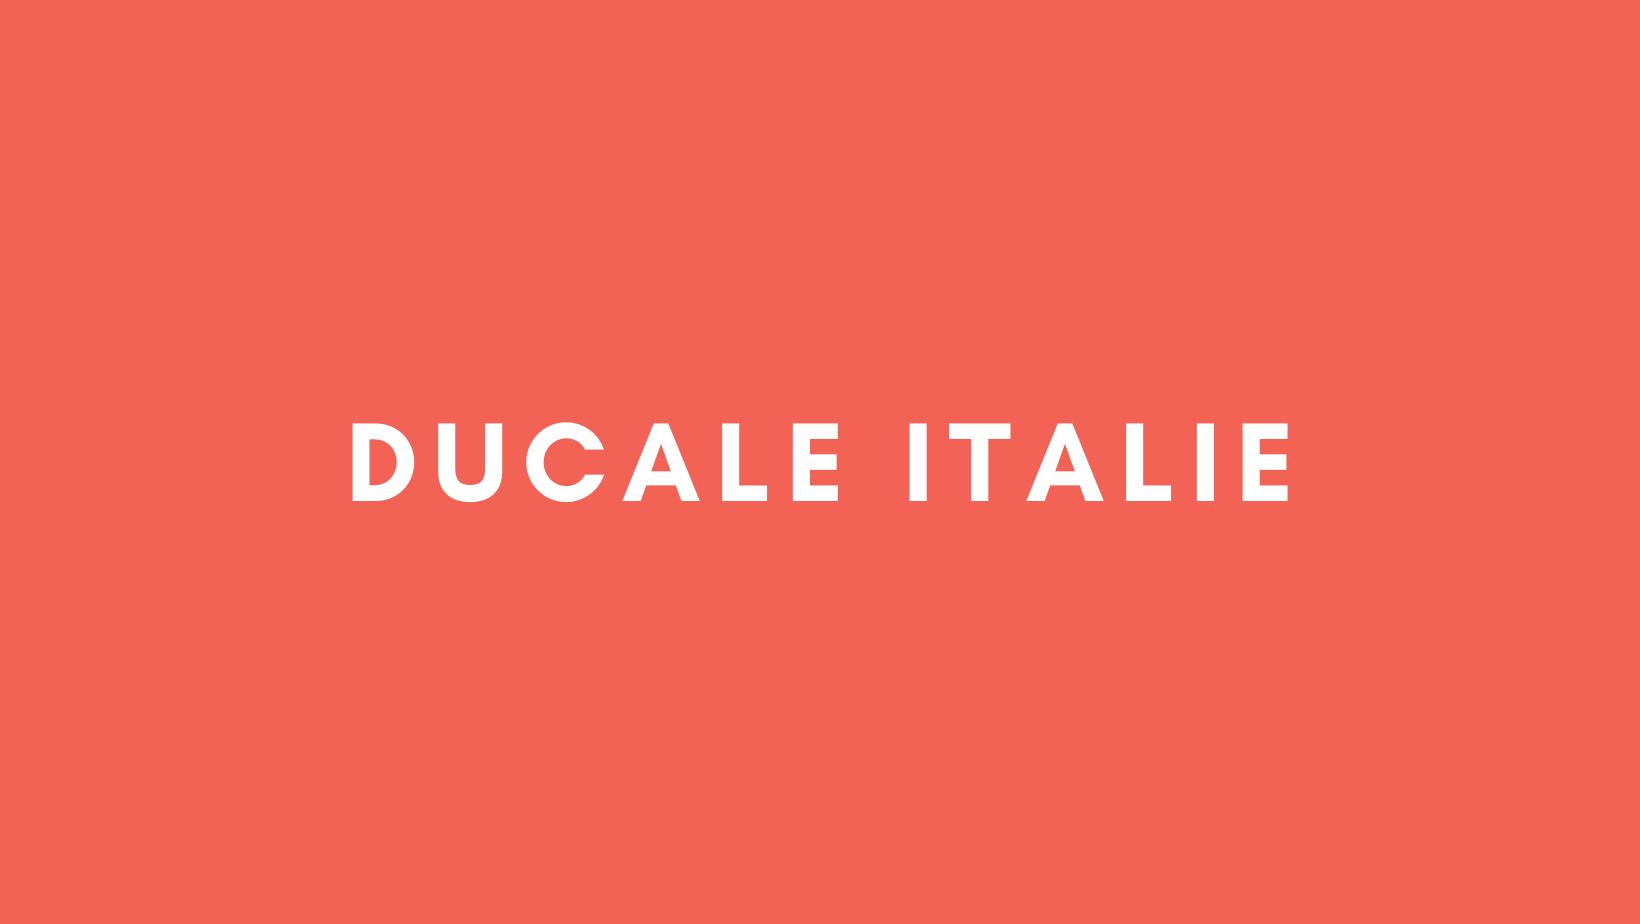 Ducale Italie